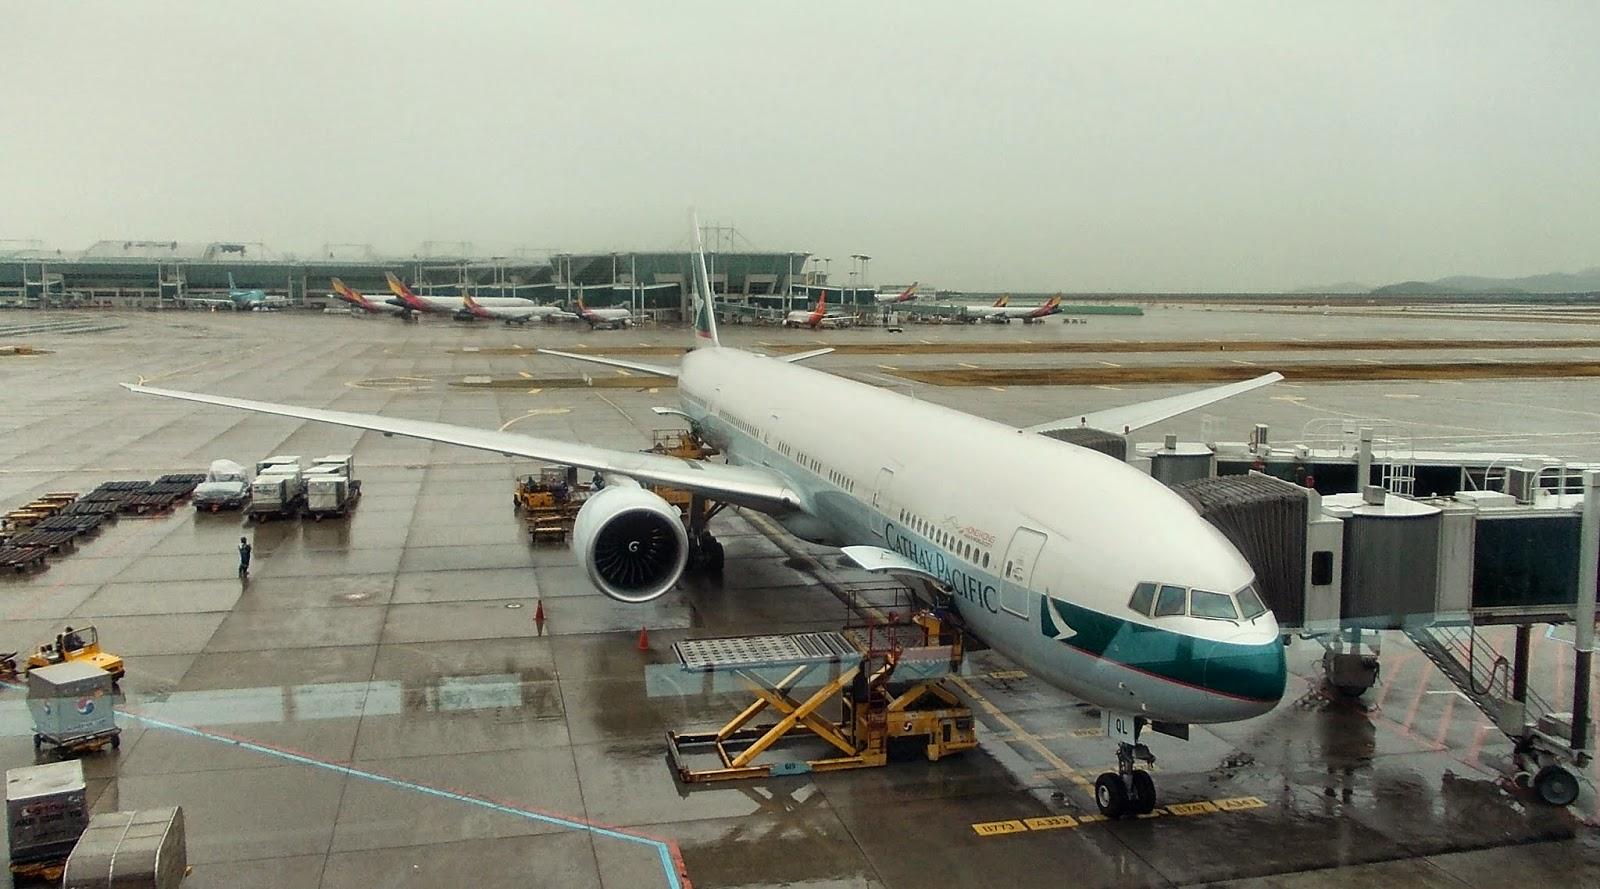 KS's Blog: Fly to Hong Kong with Cathay Pacific. part 2/キャセイパシフィック航空で香港へ(その2)